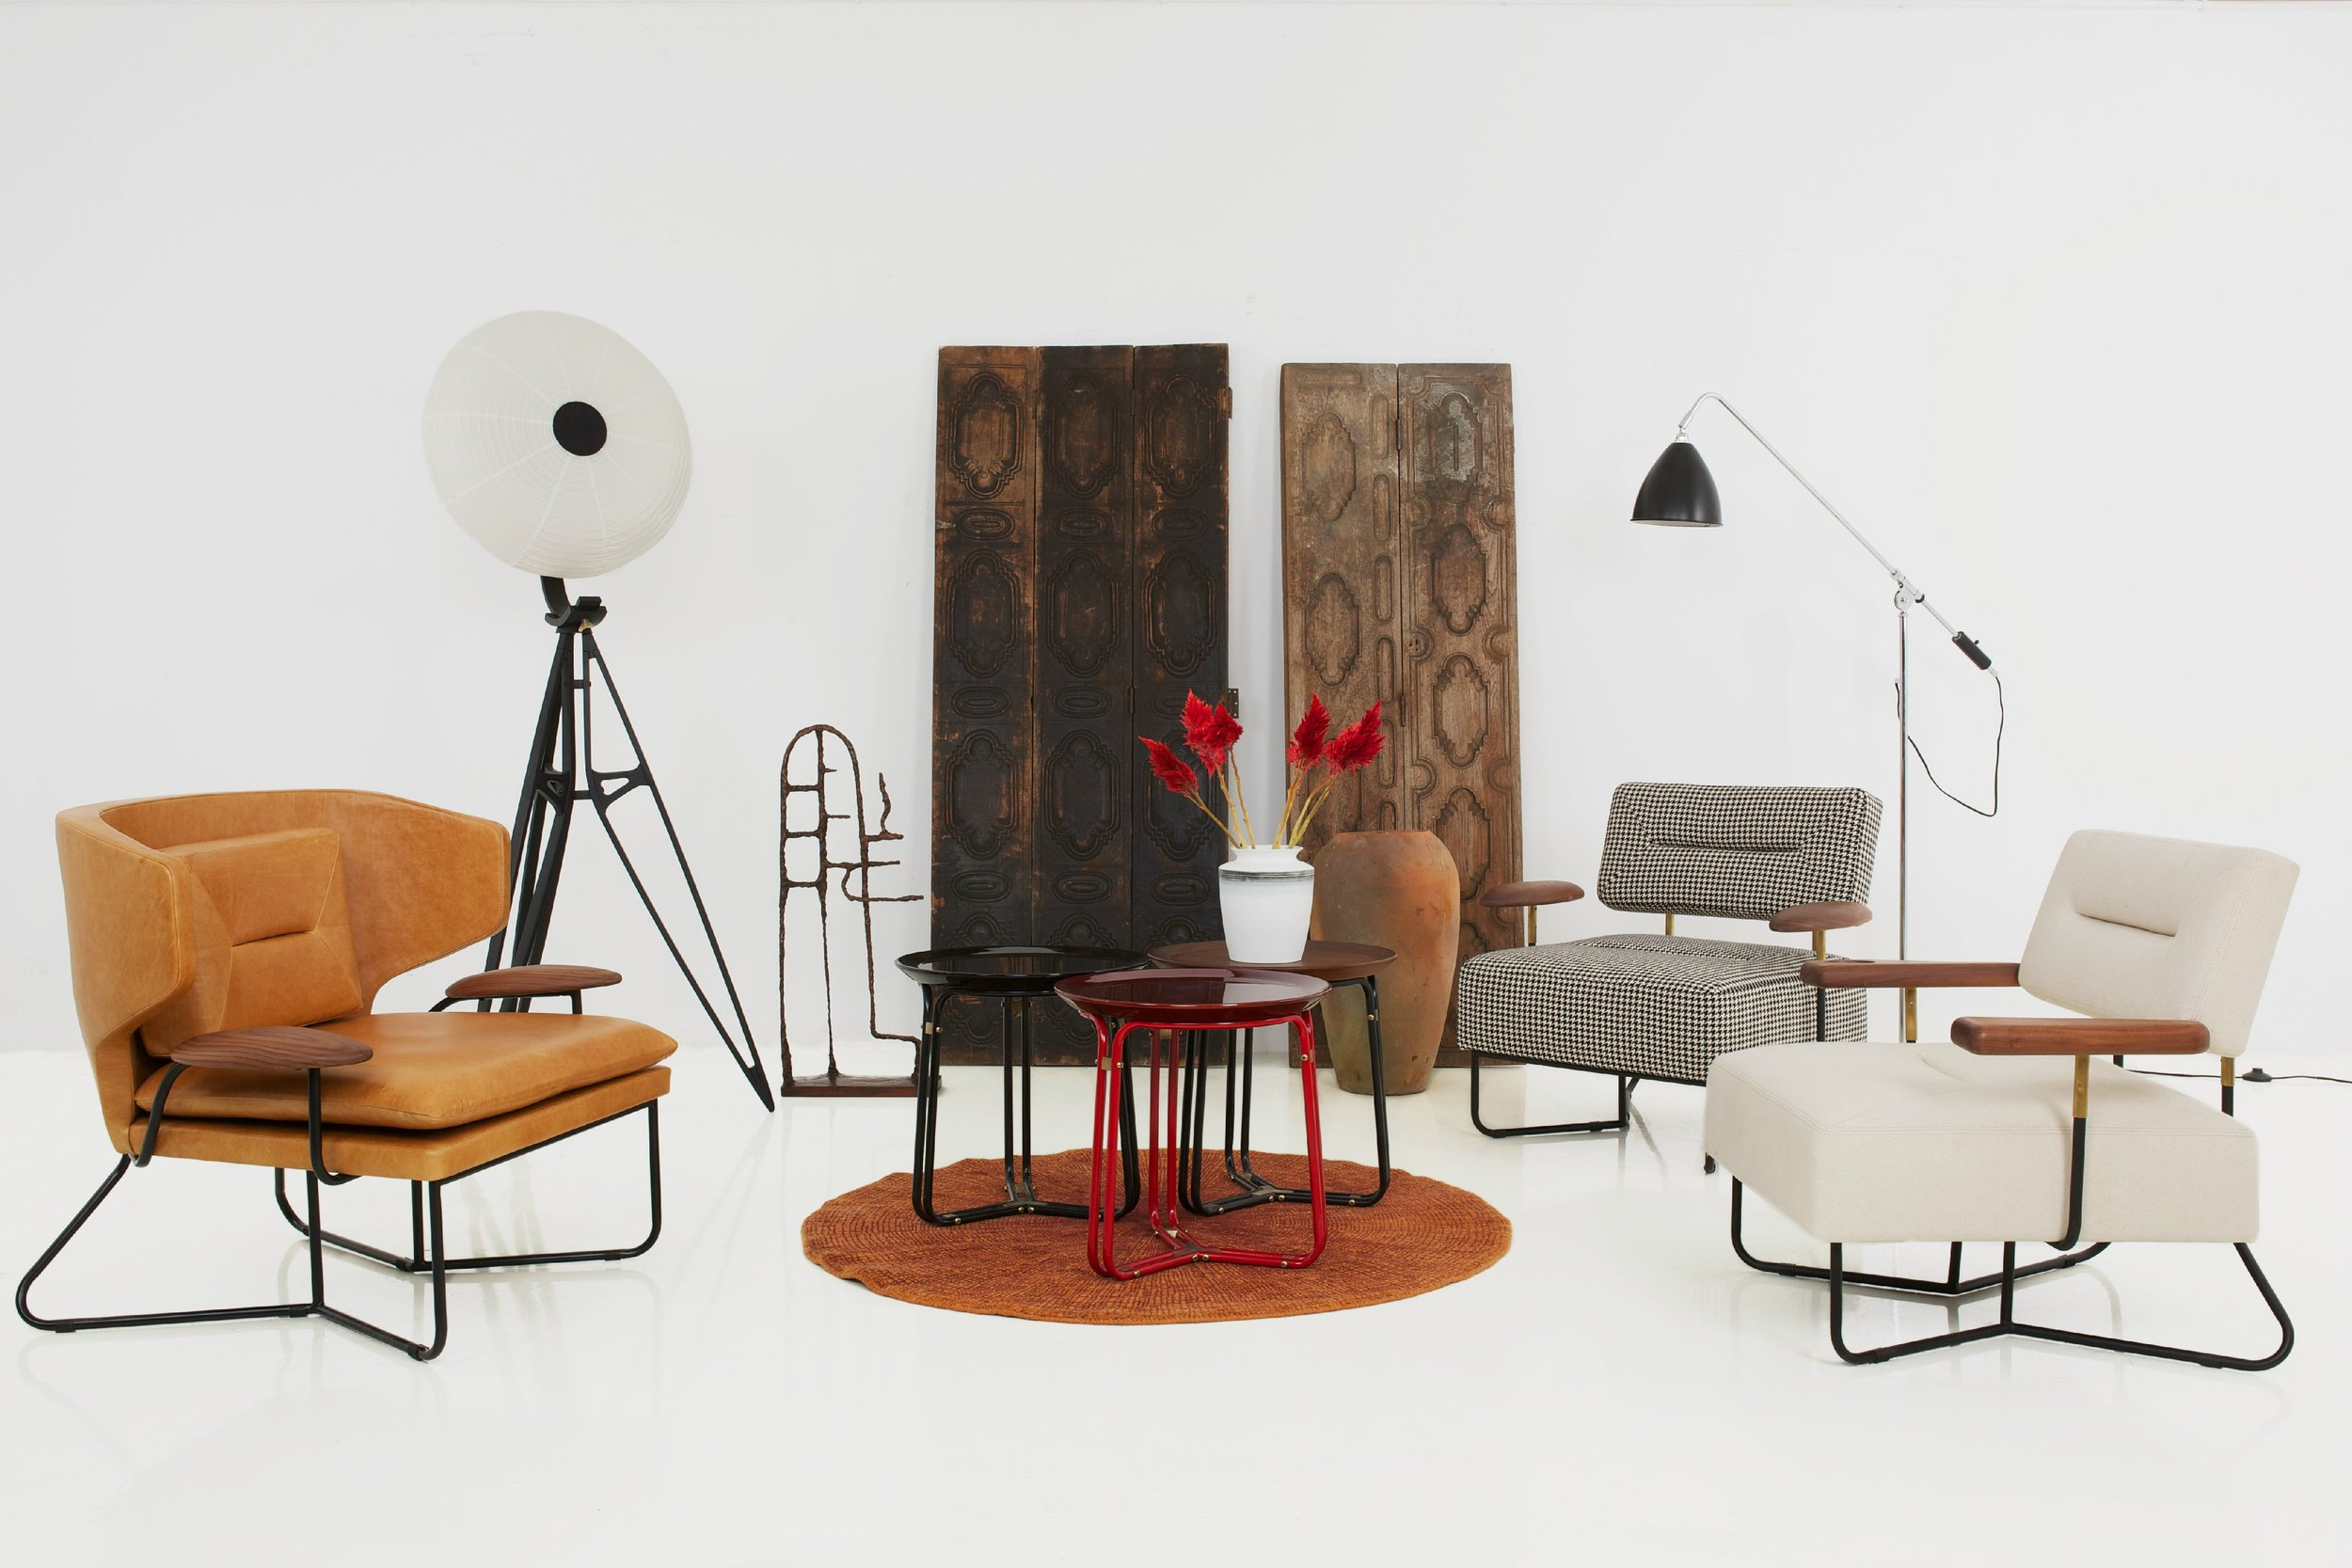 Stellar Works Chillax Lounge and Chillax table